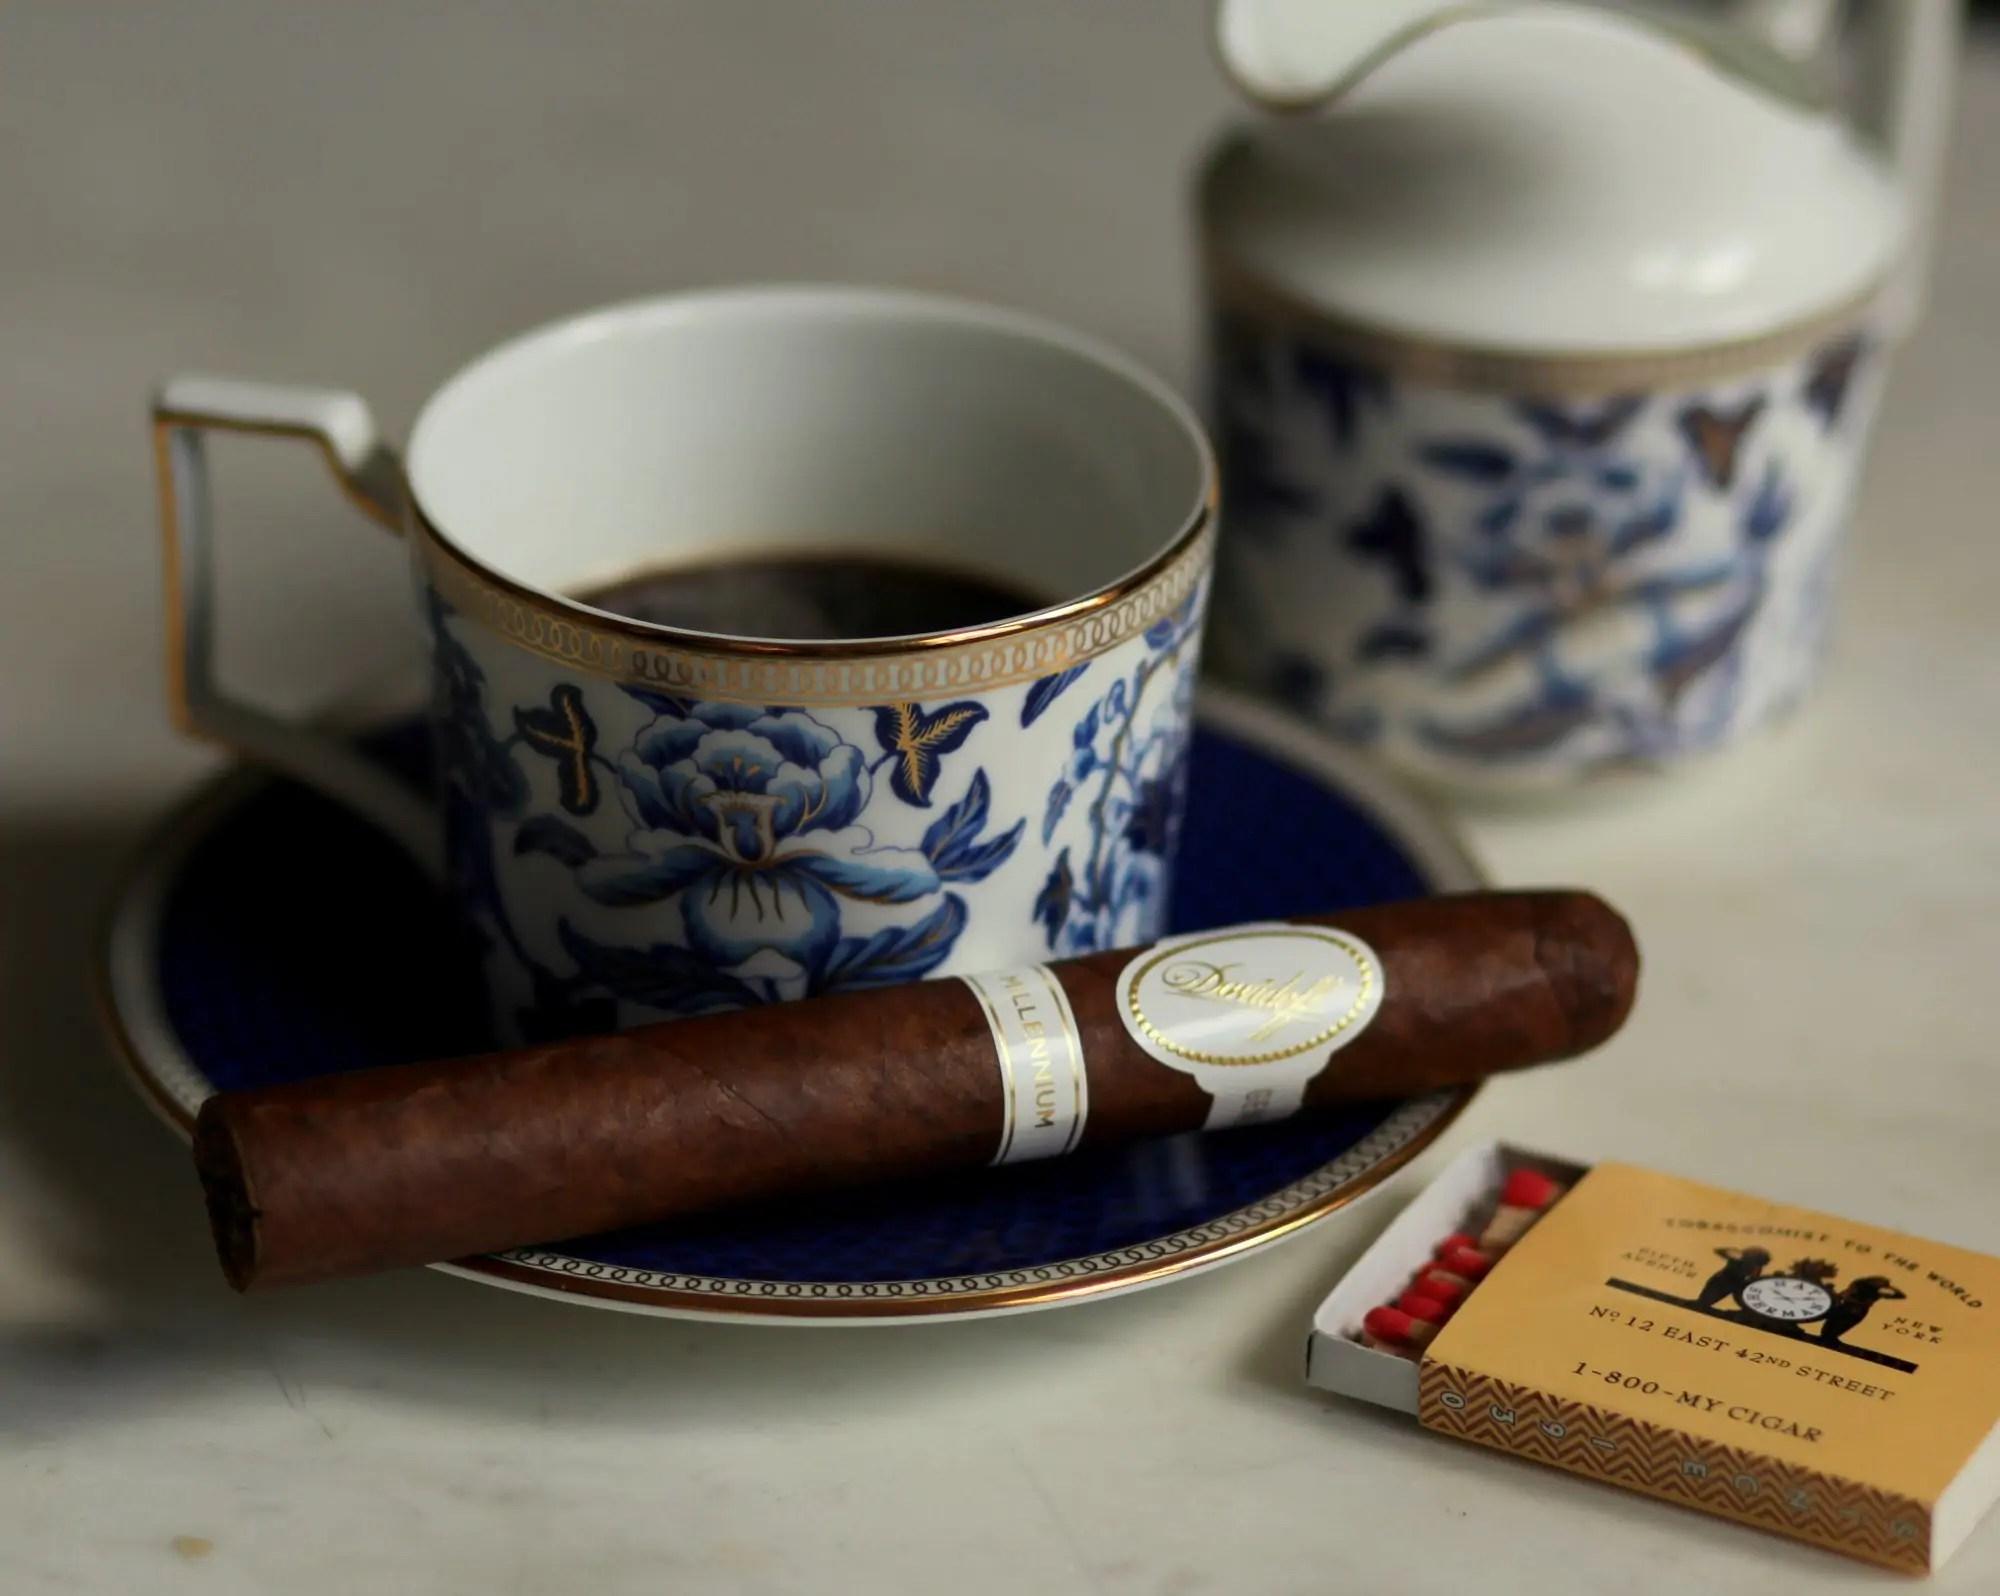 Davidoff Millennium Blend Toro Review - Fine Tobacco NYC